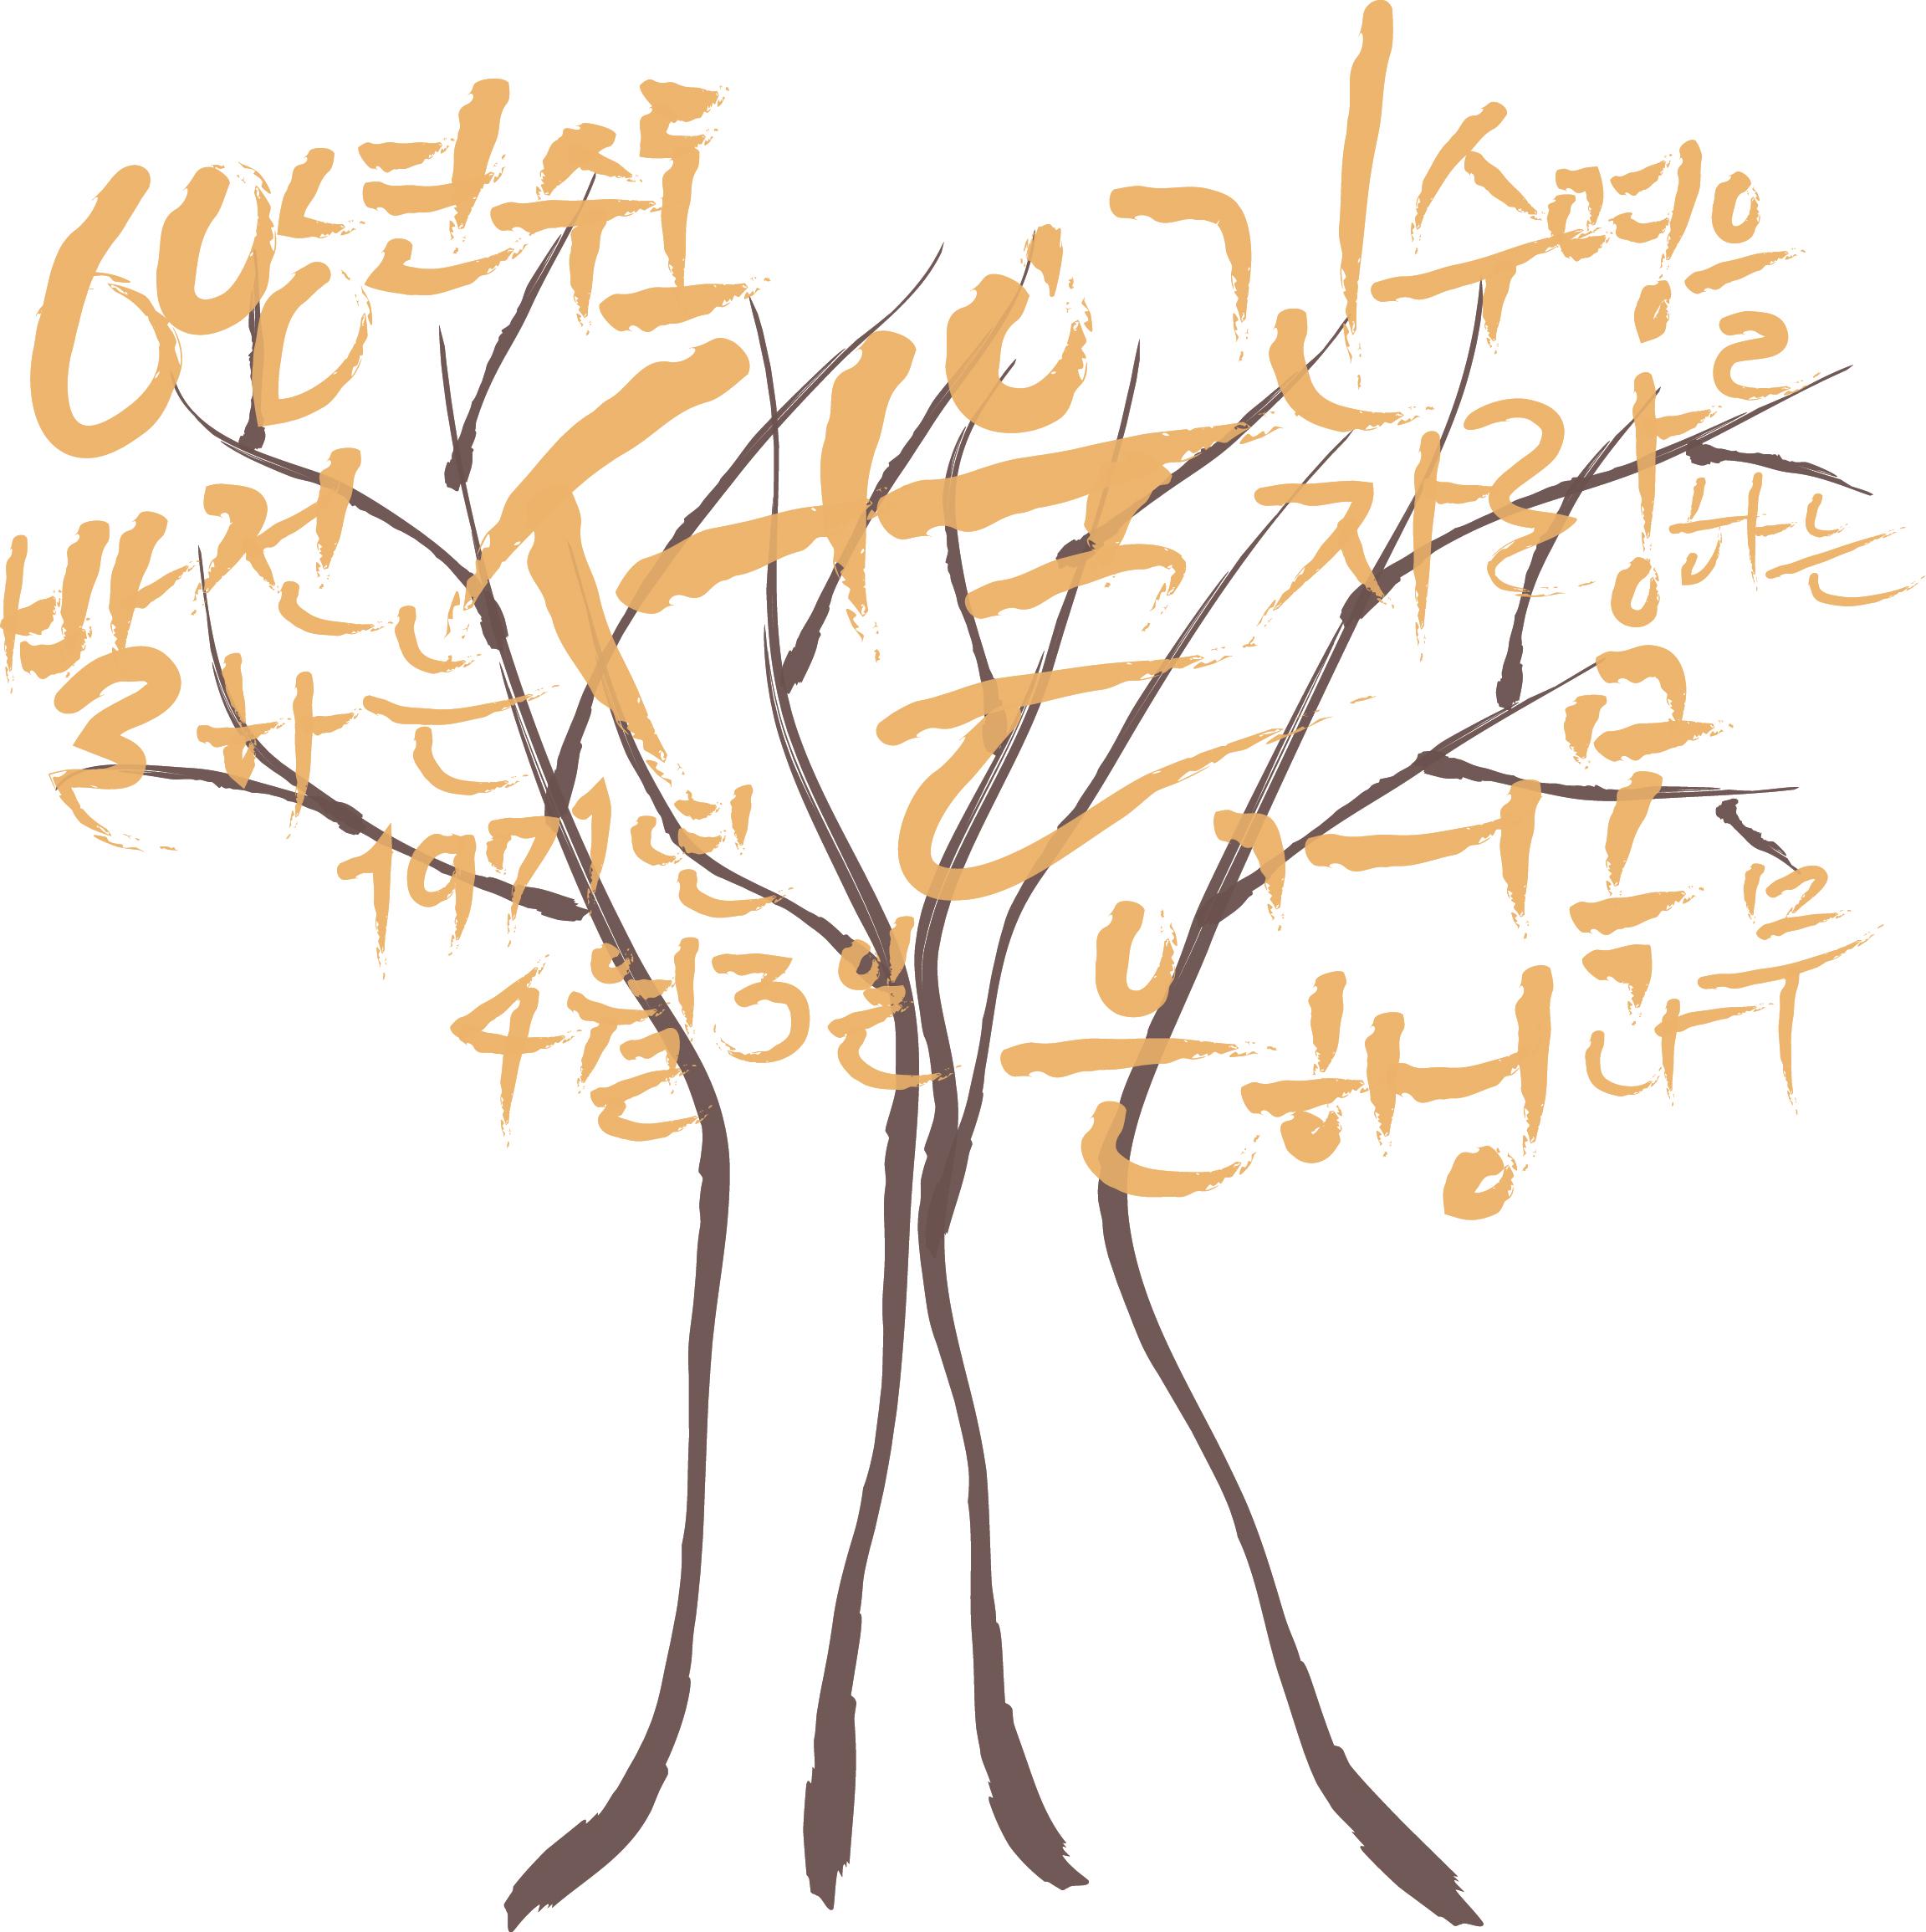 Seoul Typography Contest - chorong kim